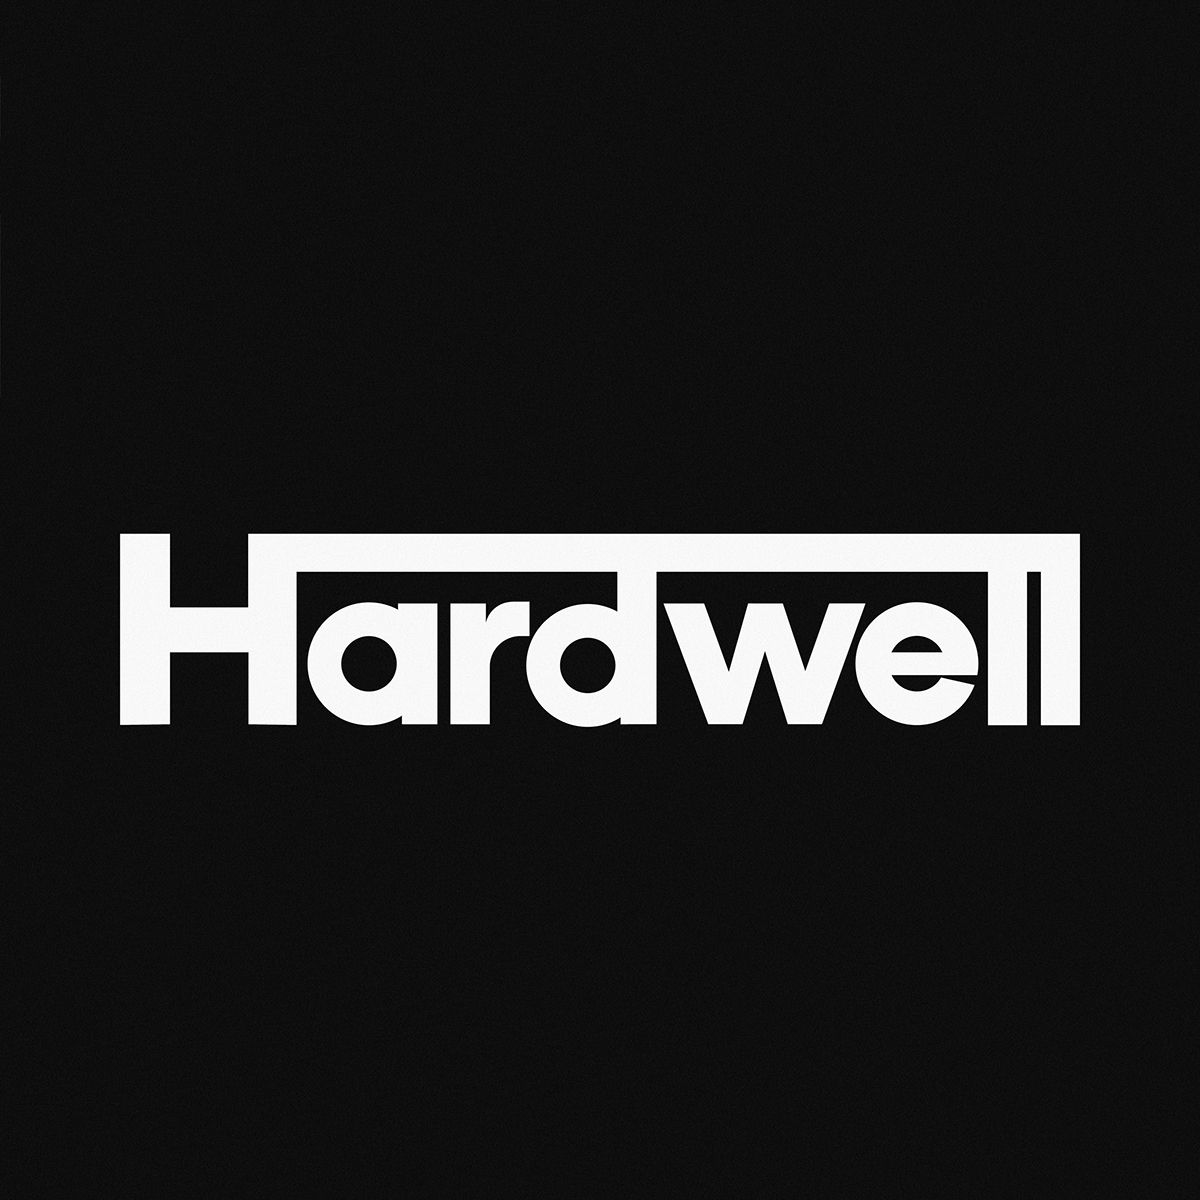 DJ Hardwell Logo Design